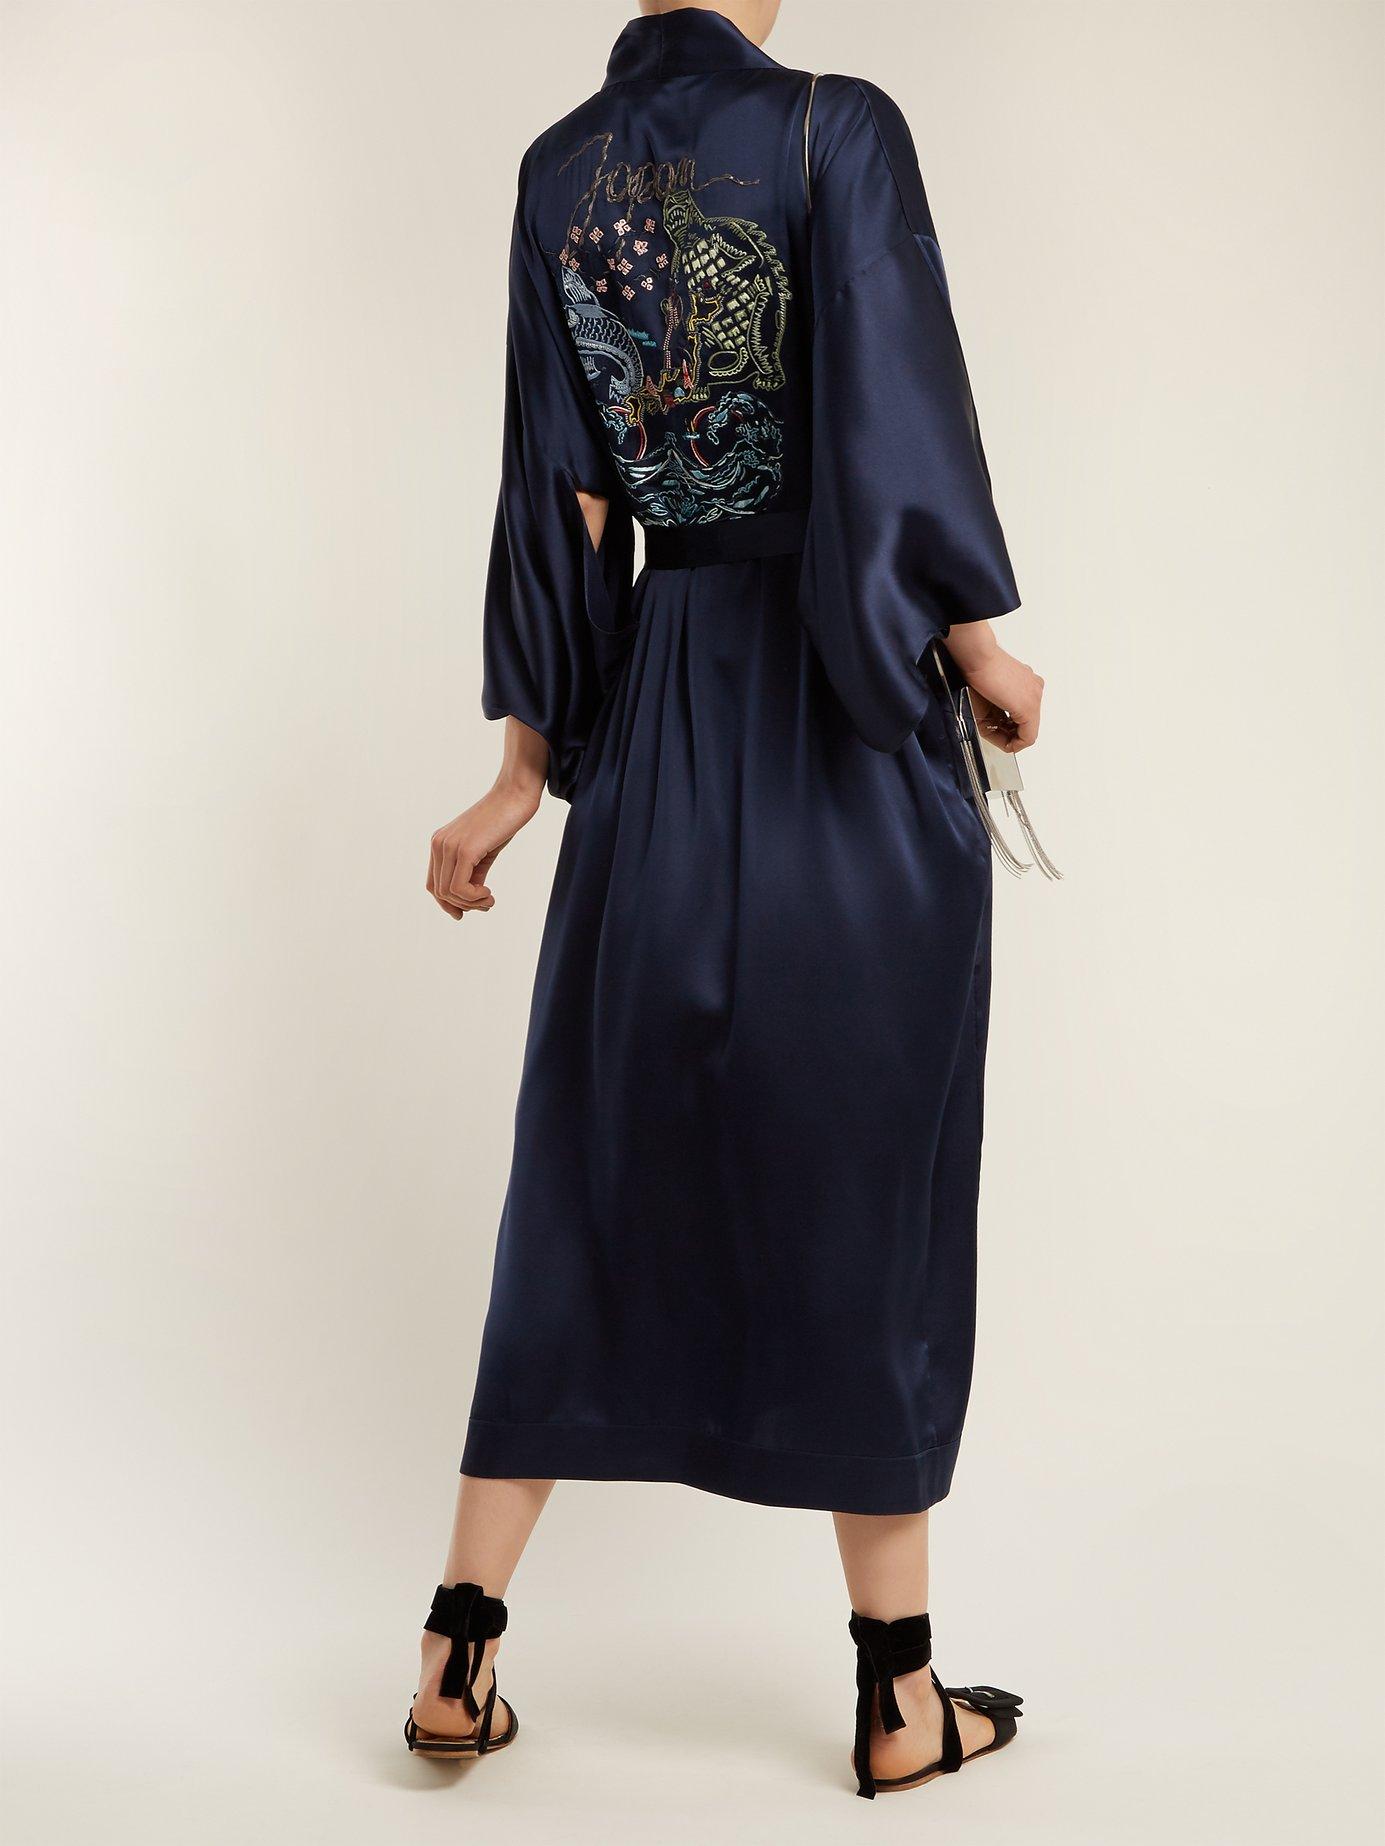 Embroidered silk kimono jacket by Chufy